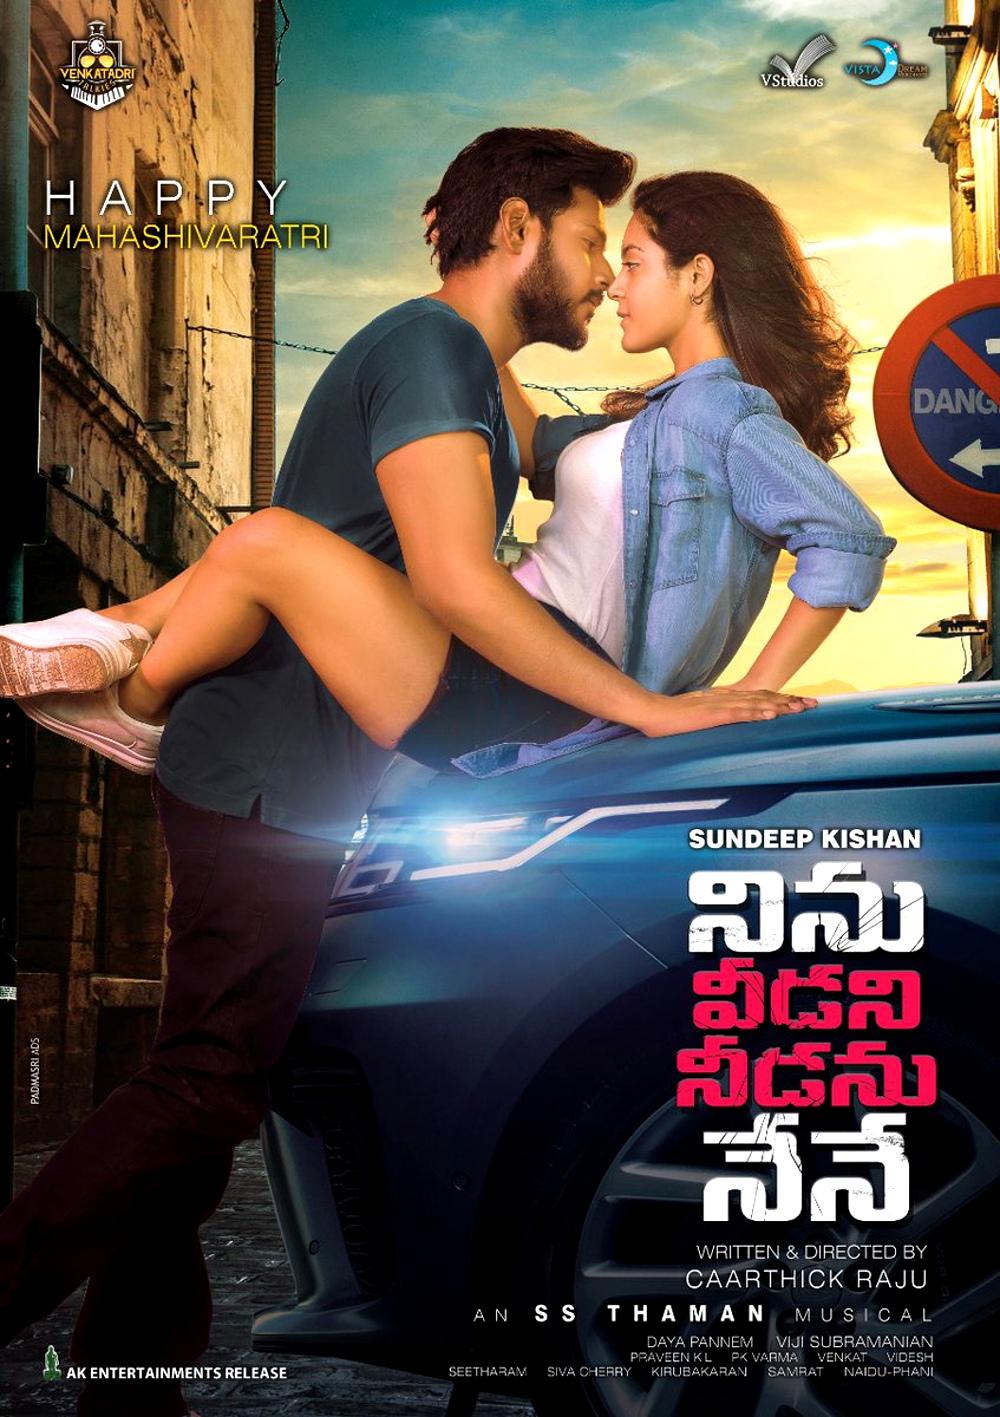 Sundeep Kishan Anya Singh Ninu Veedani Needanu Nene Second Look Poster